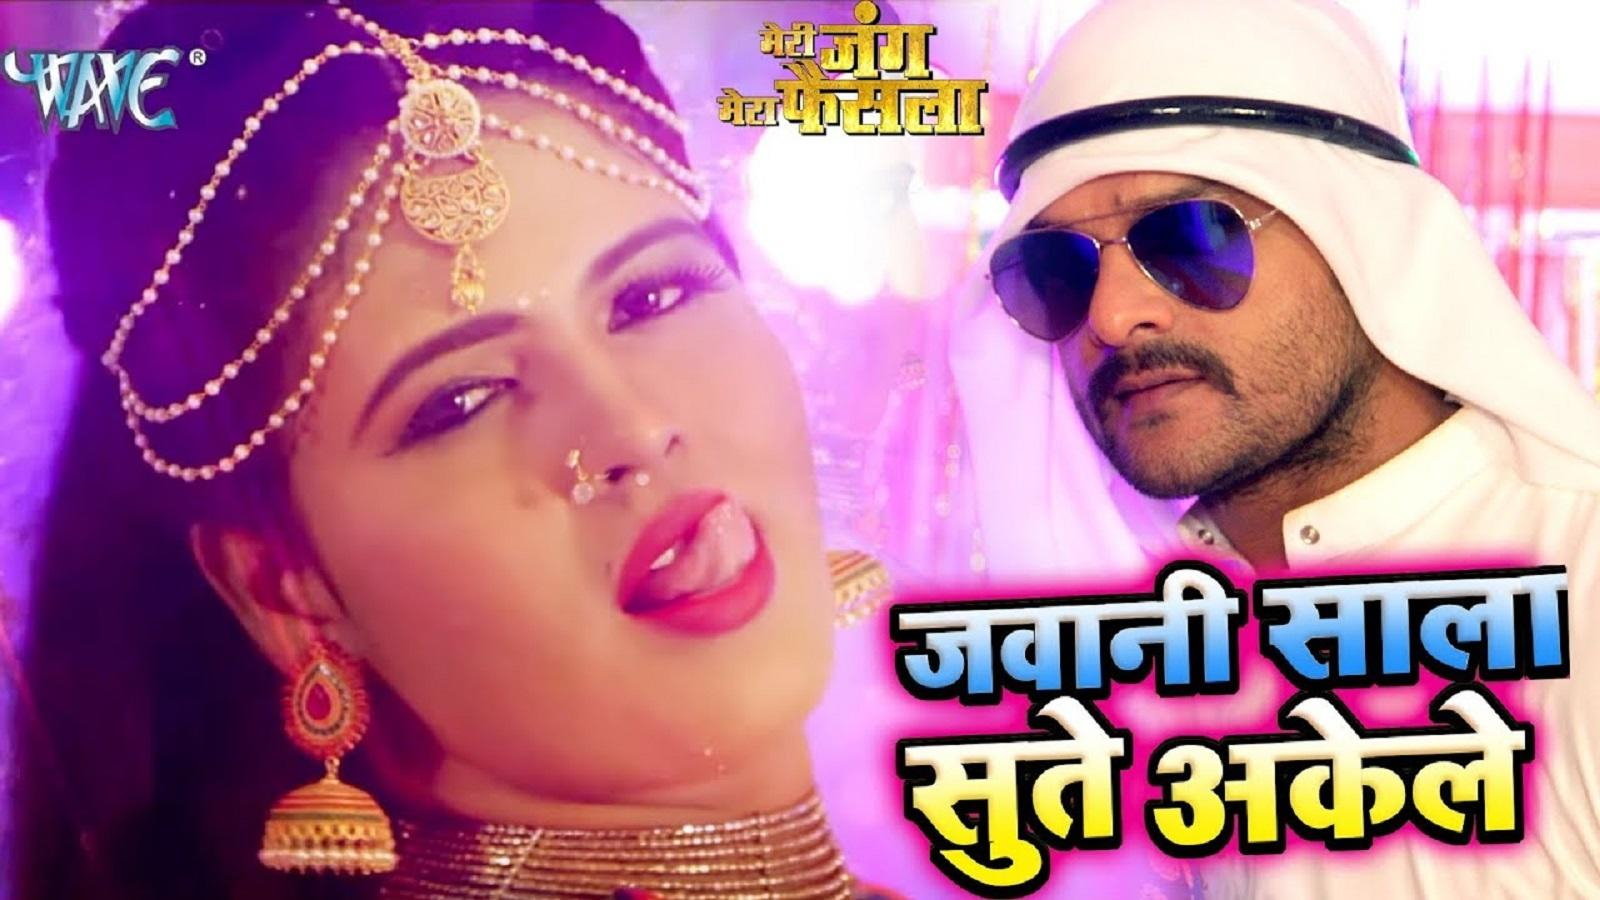 Watch Khesari Lal Yadav Ka Naya Bhojpuri Gana Video Song: Khesari Lal Yadav  and Mamta Raut latest Bhojpuri song 'Jawani Sala Sute Akele' from 'Meri  Jung Mera Faisla'